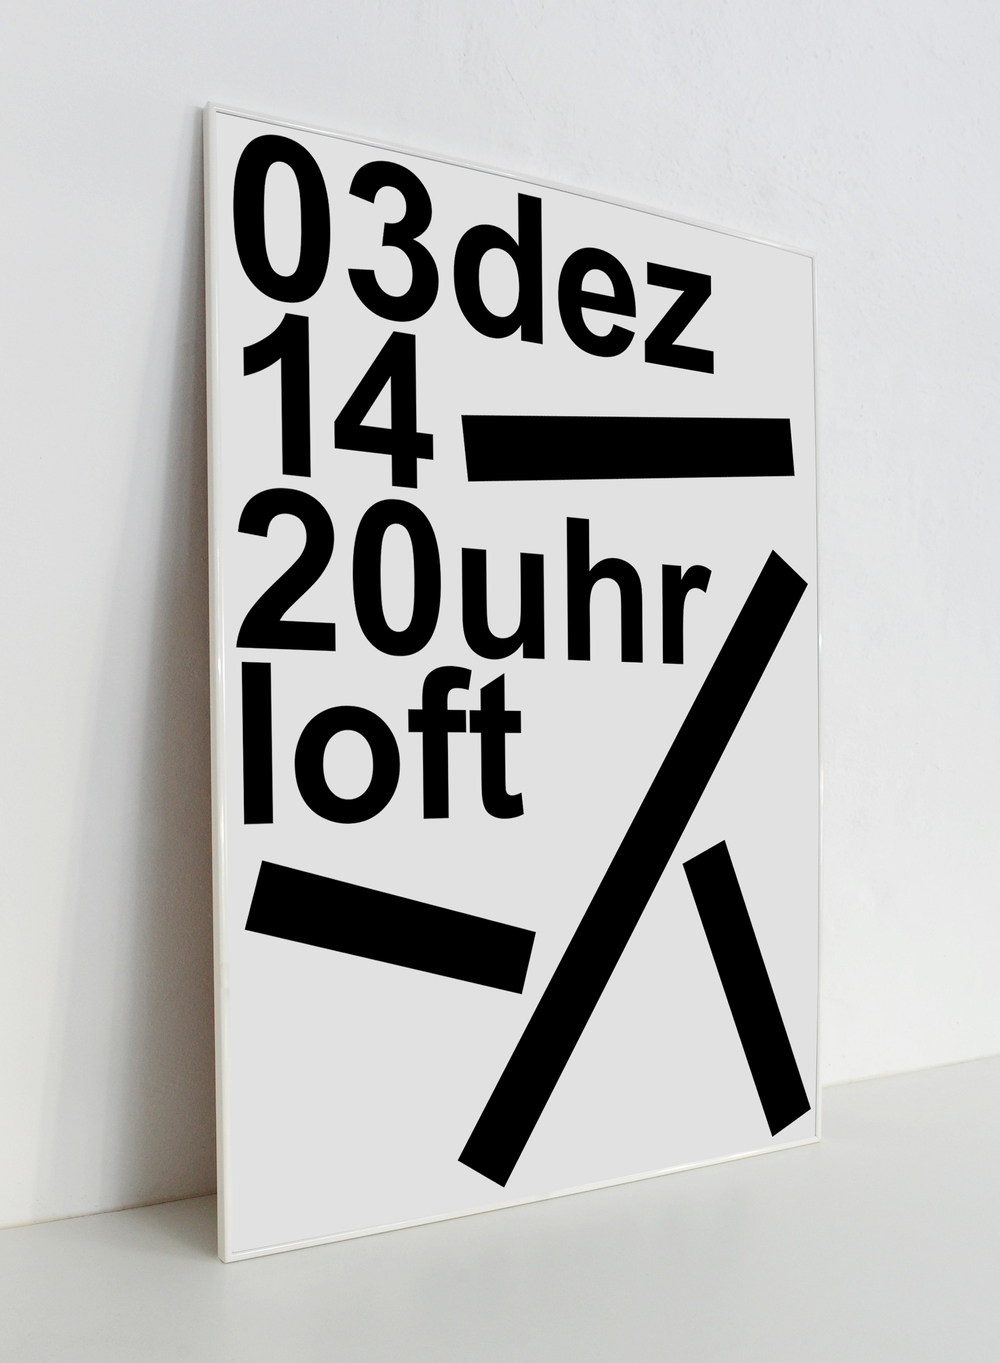 Verena_Hennig_Loft_poster8.jpg